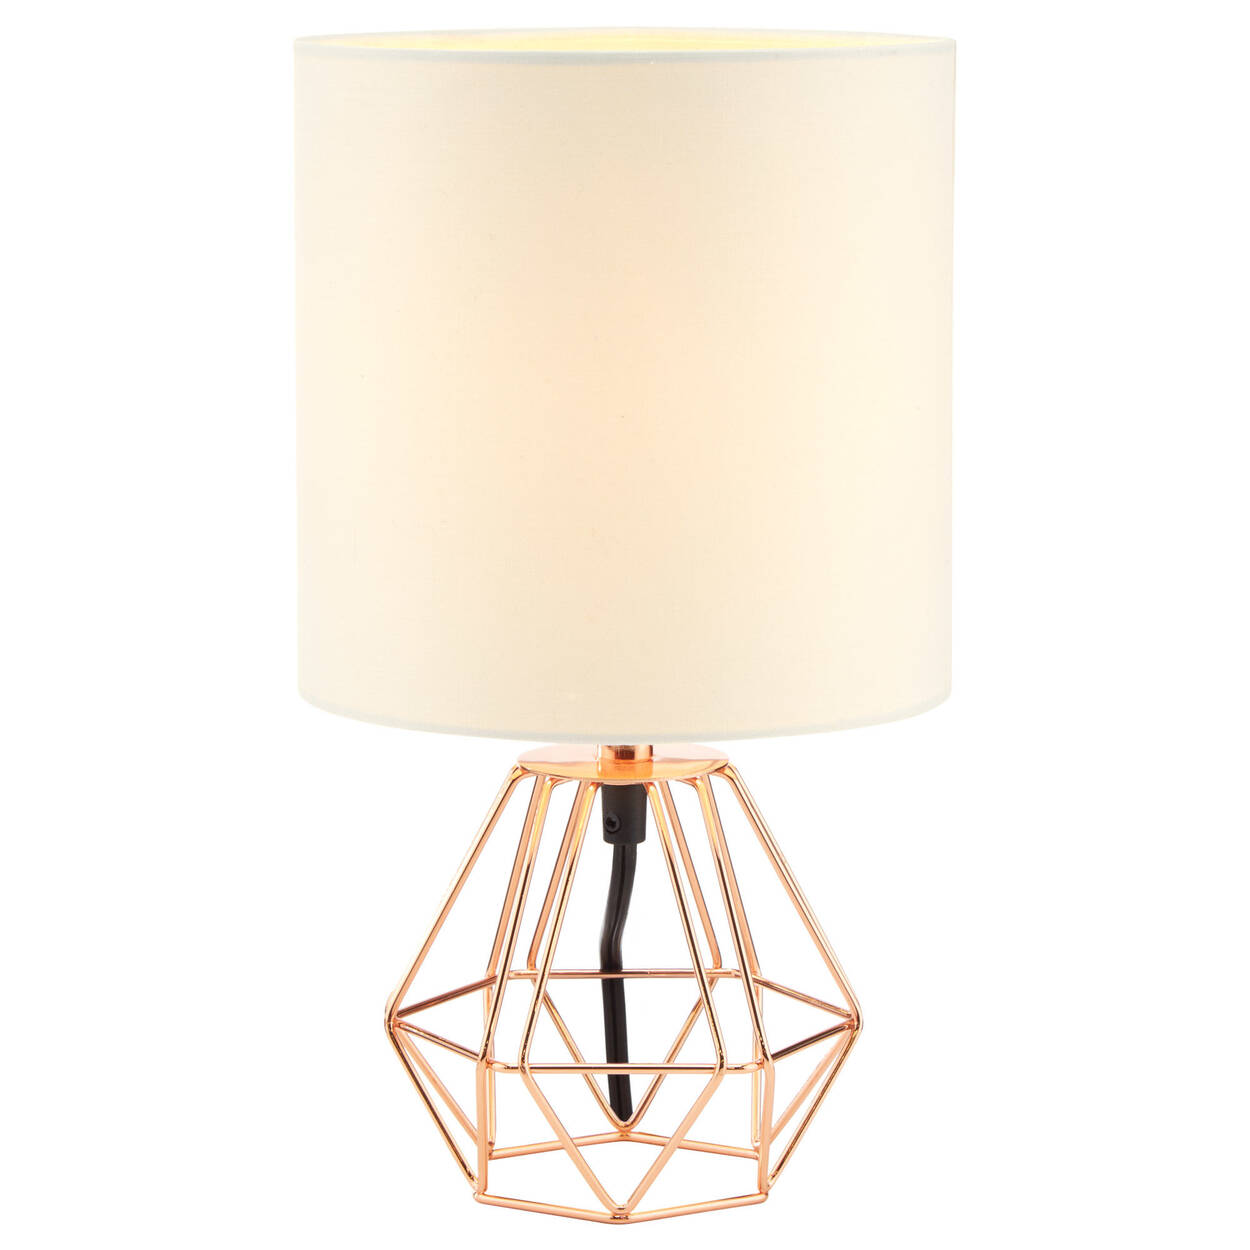 Geometric metal wire table lamp bouclair geometric metal wire table lamp mozeypictures Images